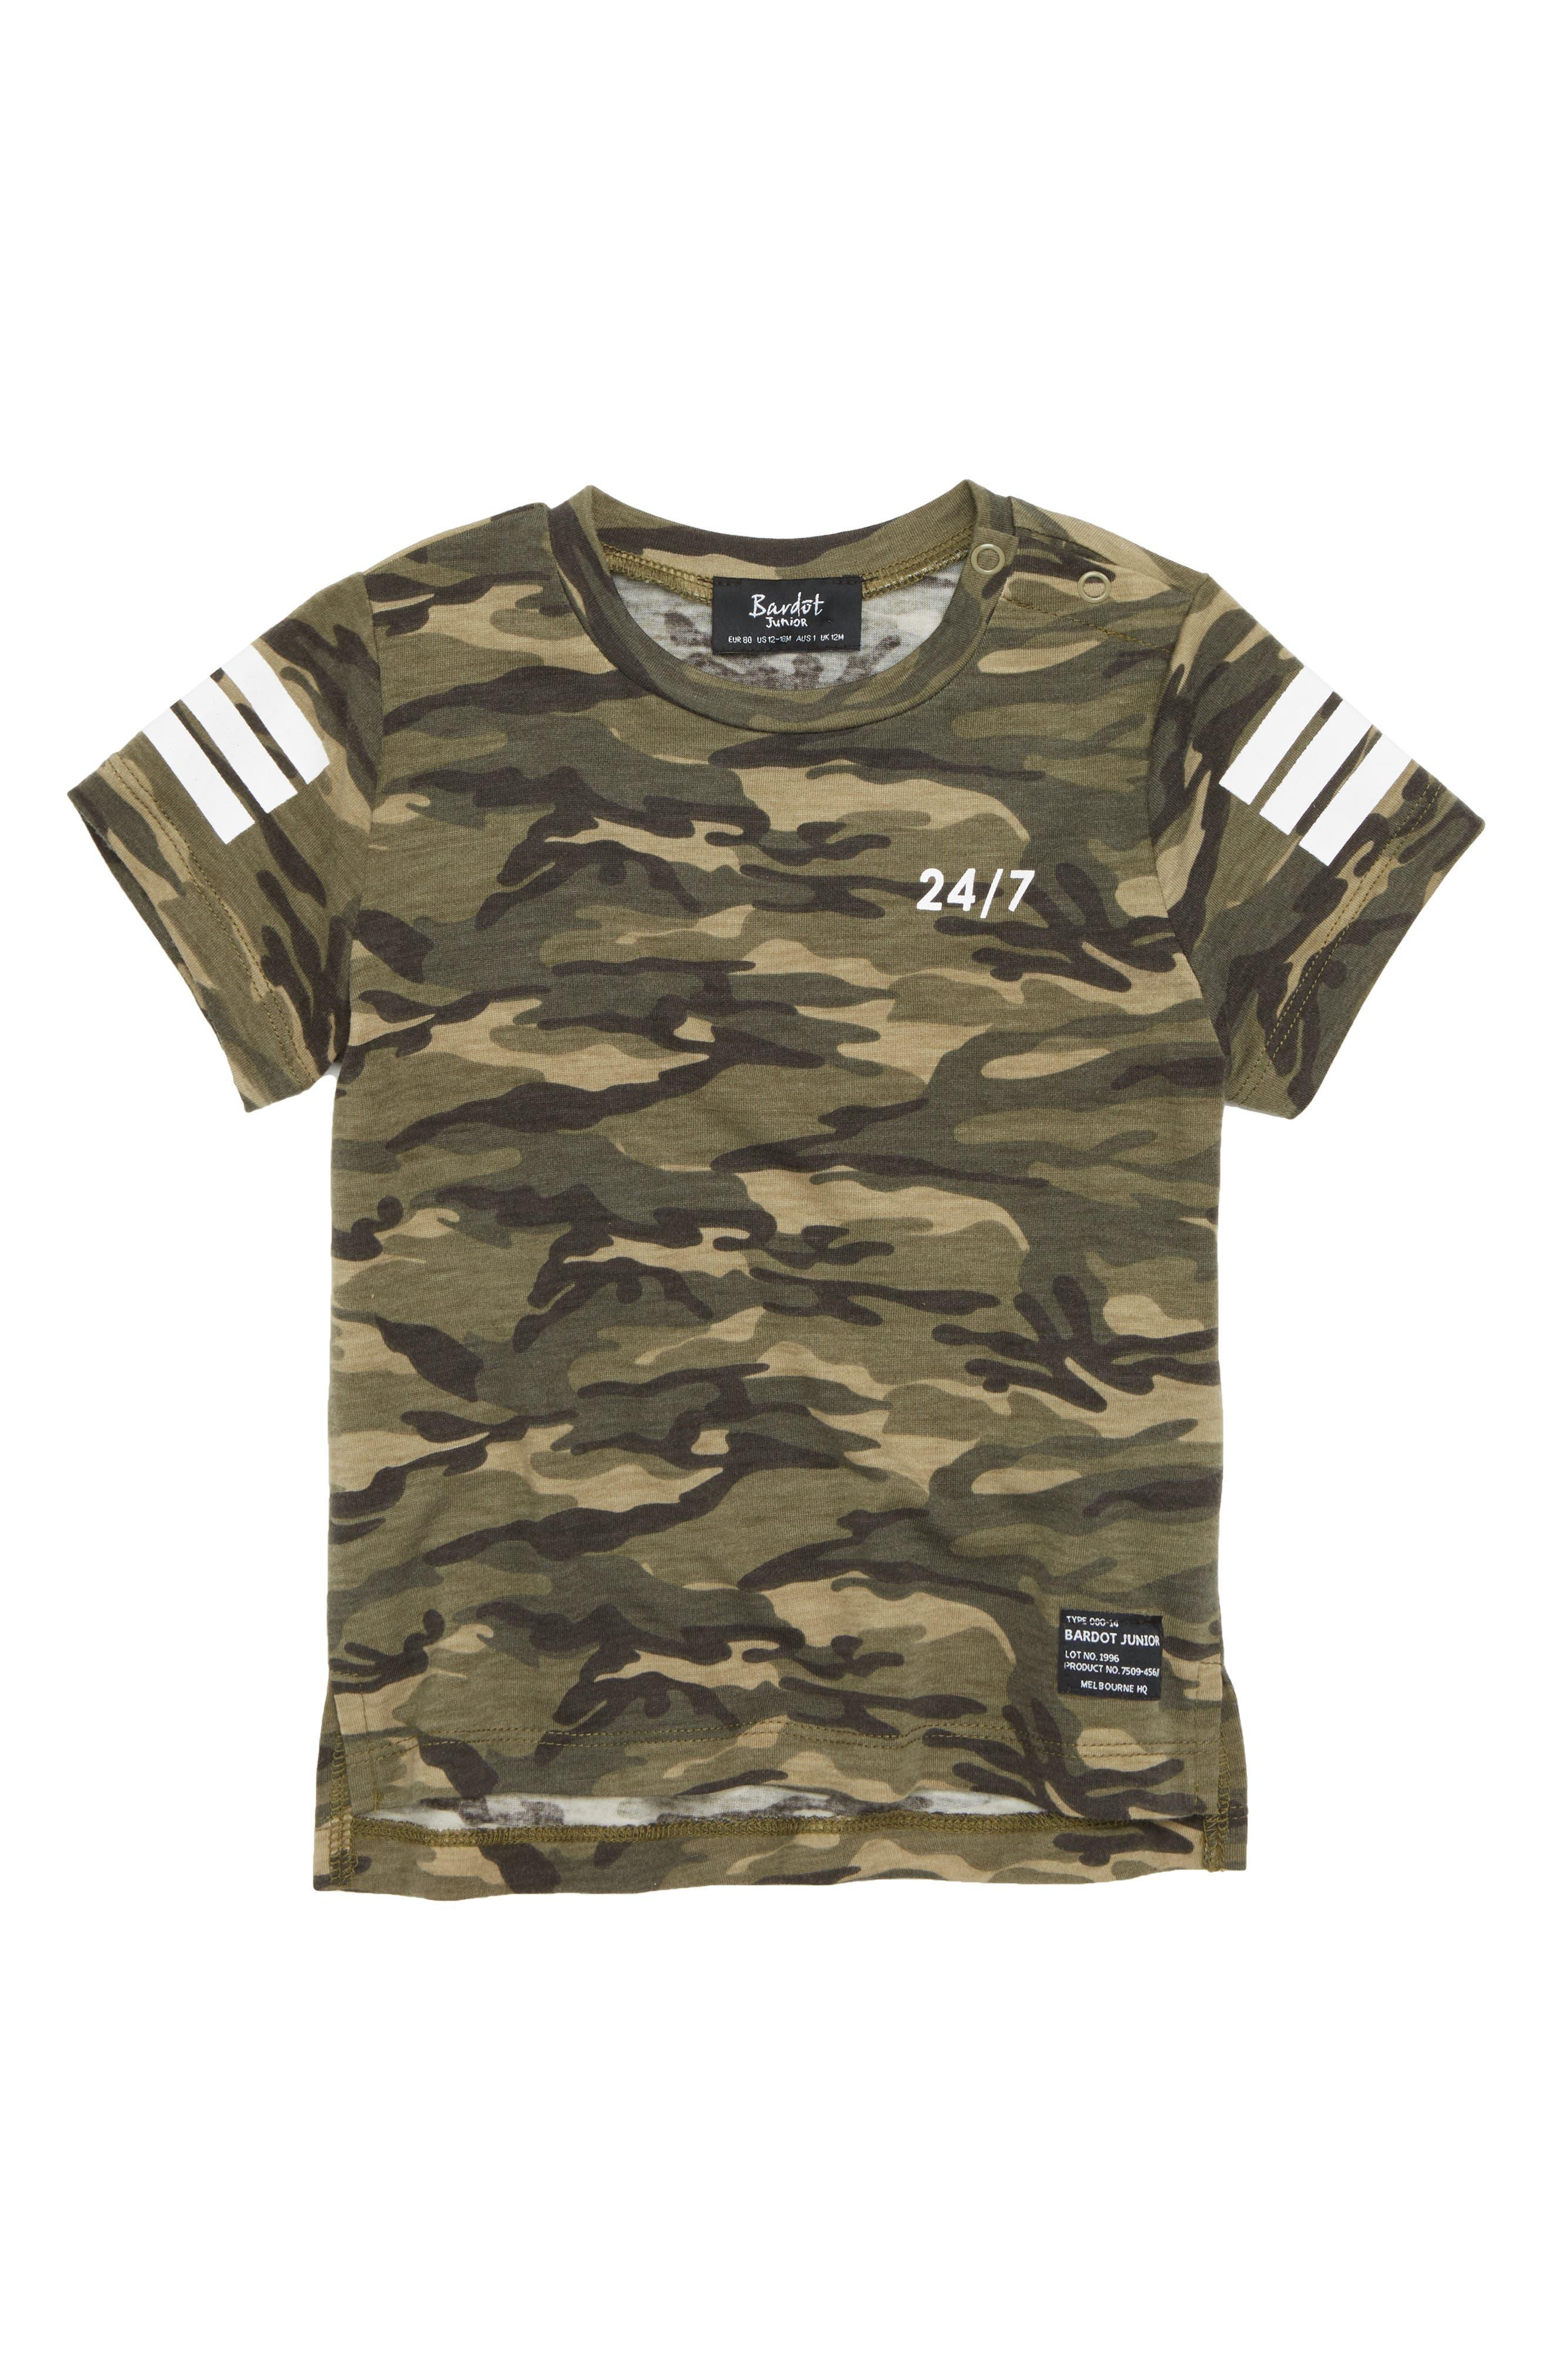 24/7 Camo T-Shirt,                             Main thumbnail 1, color,                             350